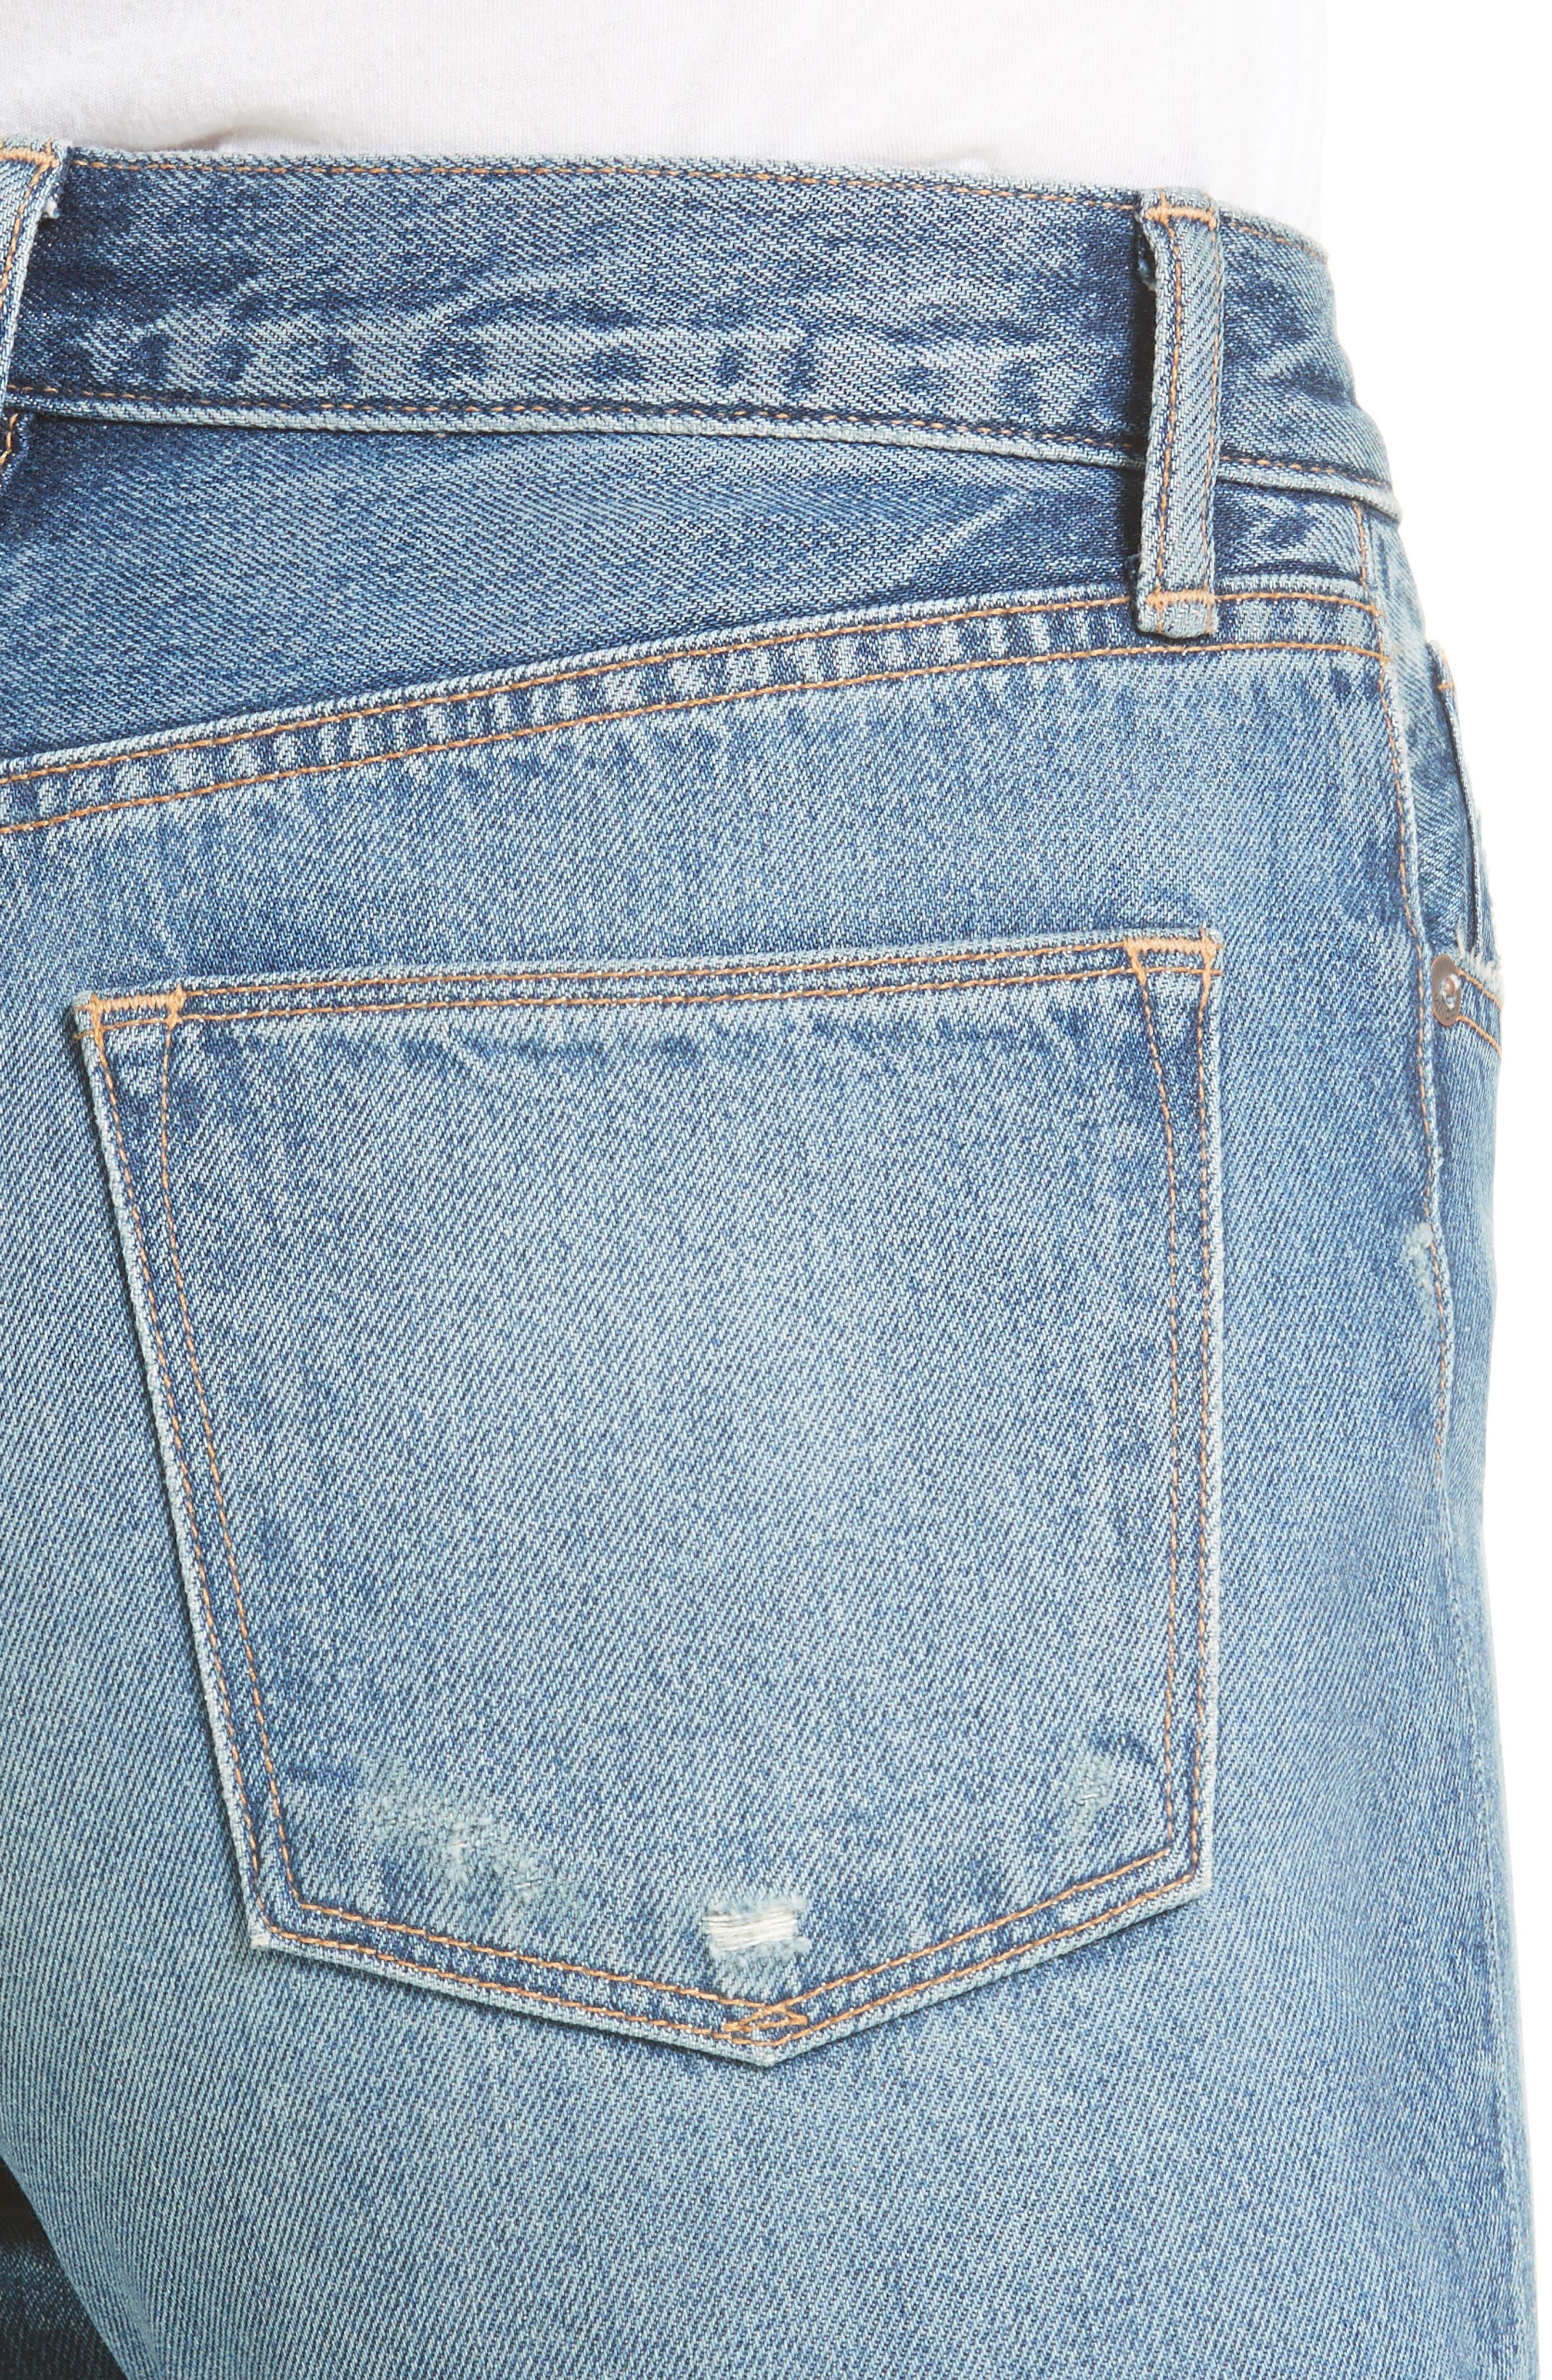 High Waist Vintage Straight Leg Jeans,                             Alternate thumbnail 4, color,                             420